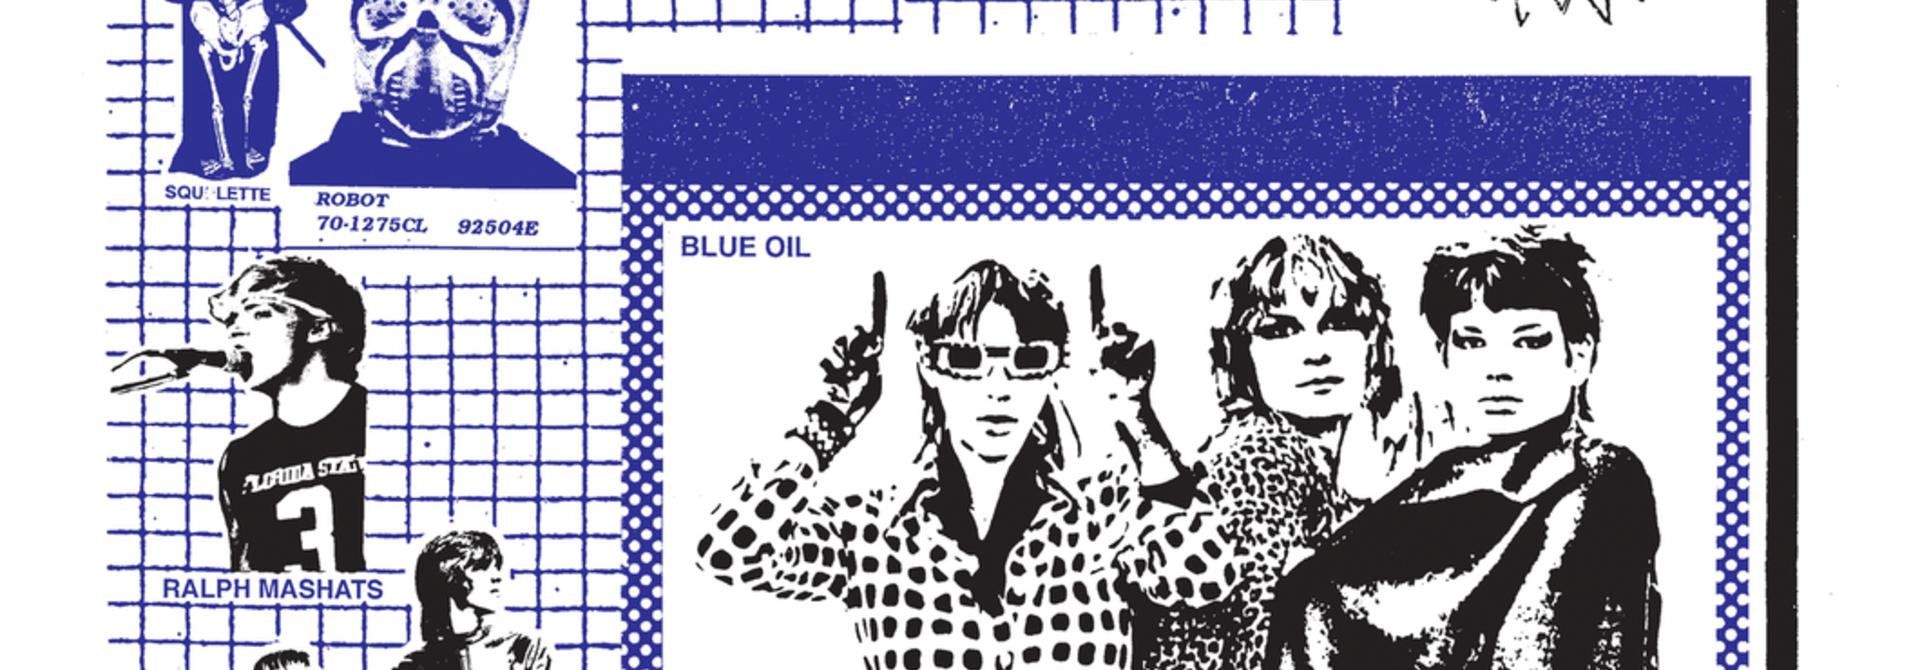 Artistes Variés • Nome Noma - Québec Post Punk et New Wave 1979-1987